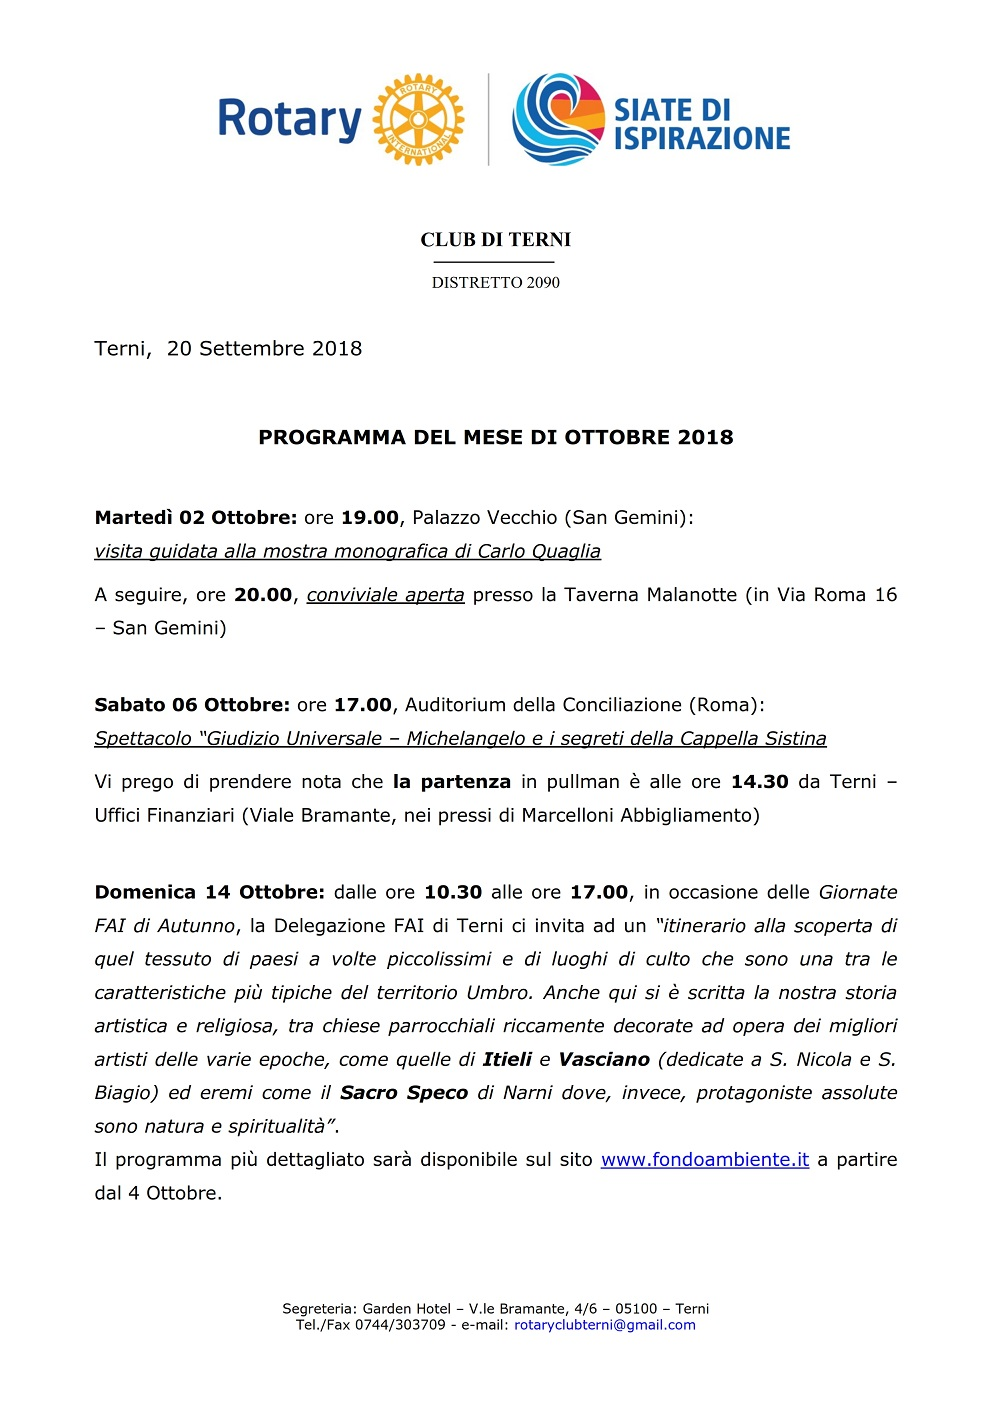 2018_10-RC Terni-Programma Ottobre 2018_001